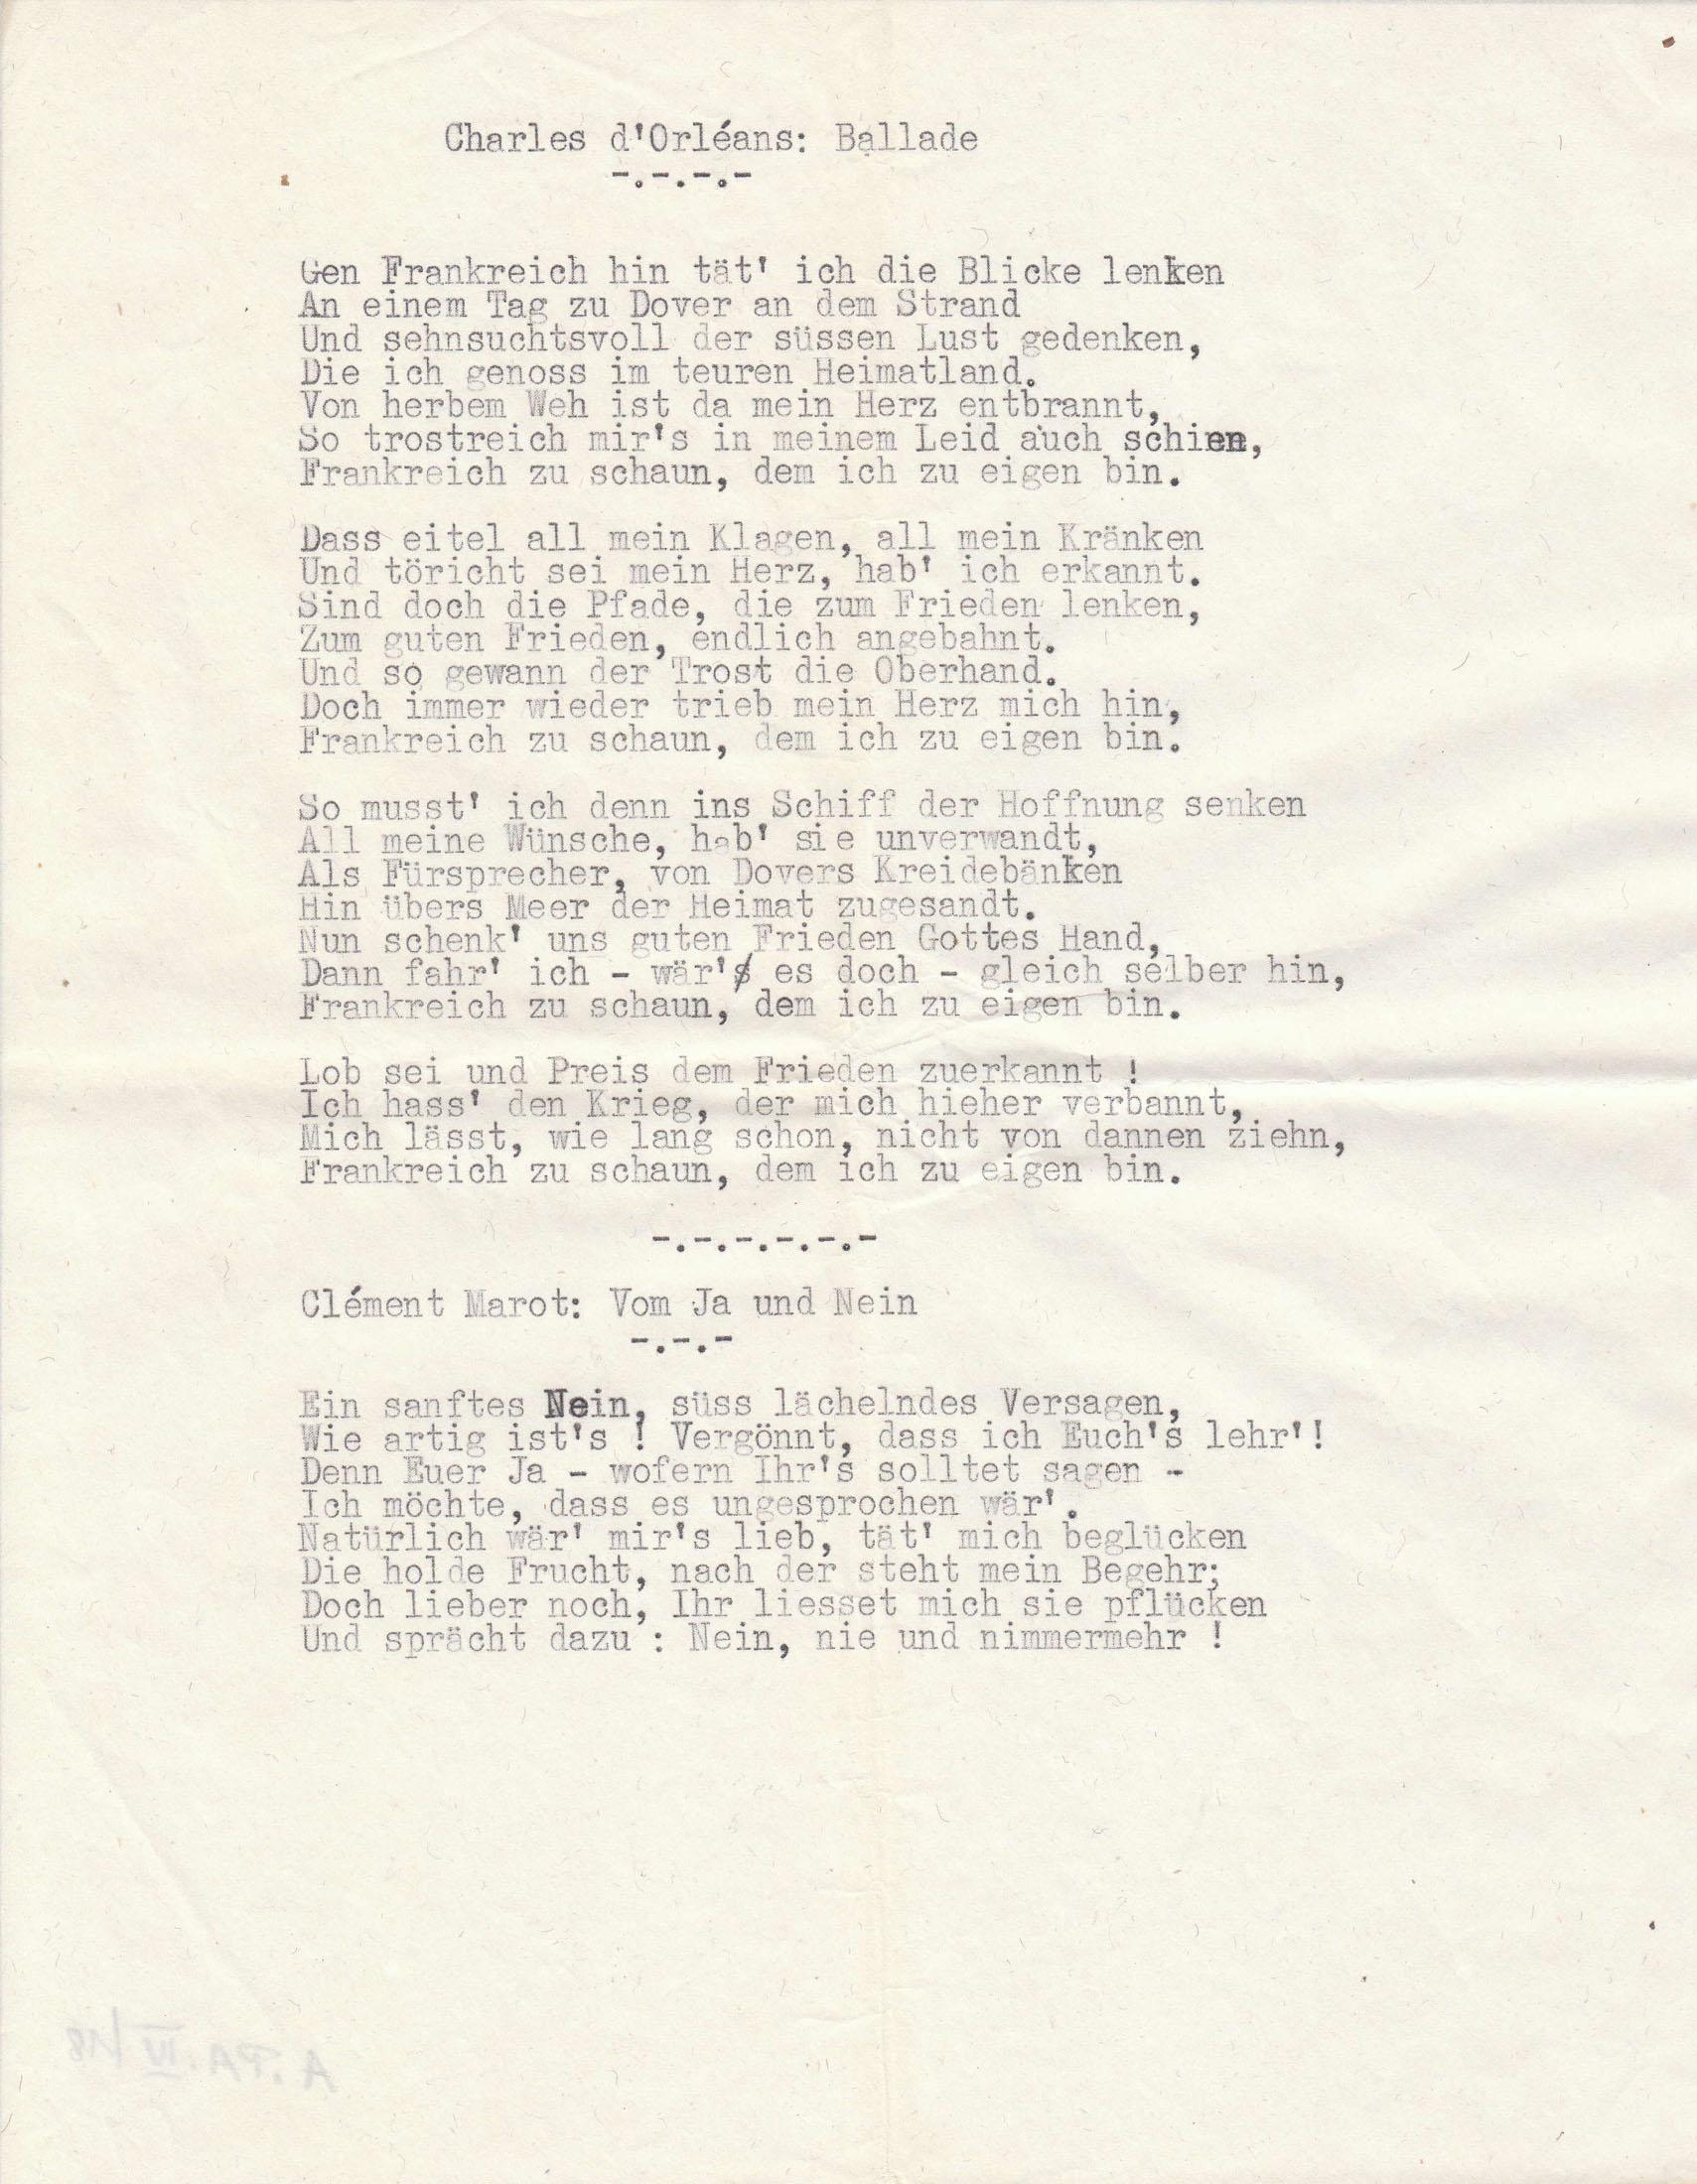 Rainer maria rilke gedichte paris